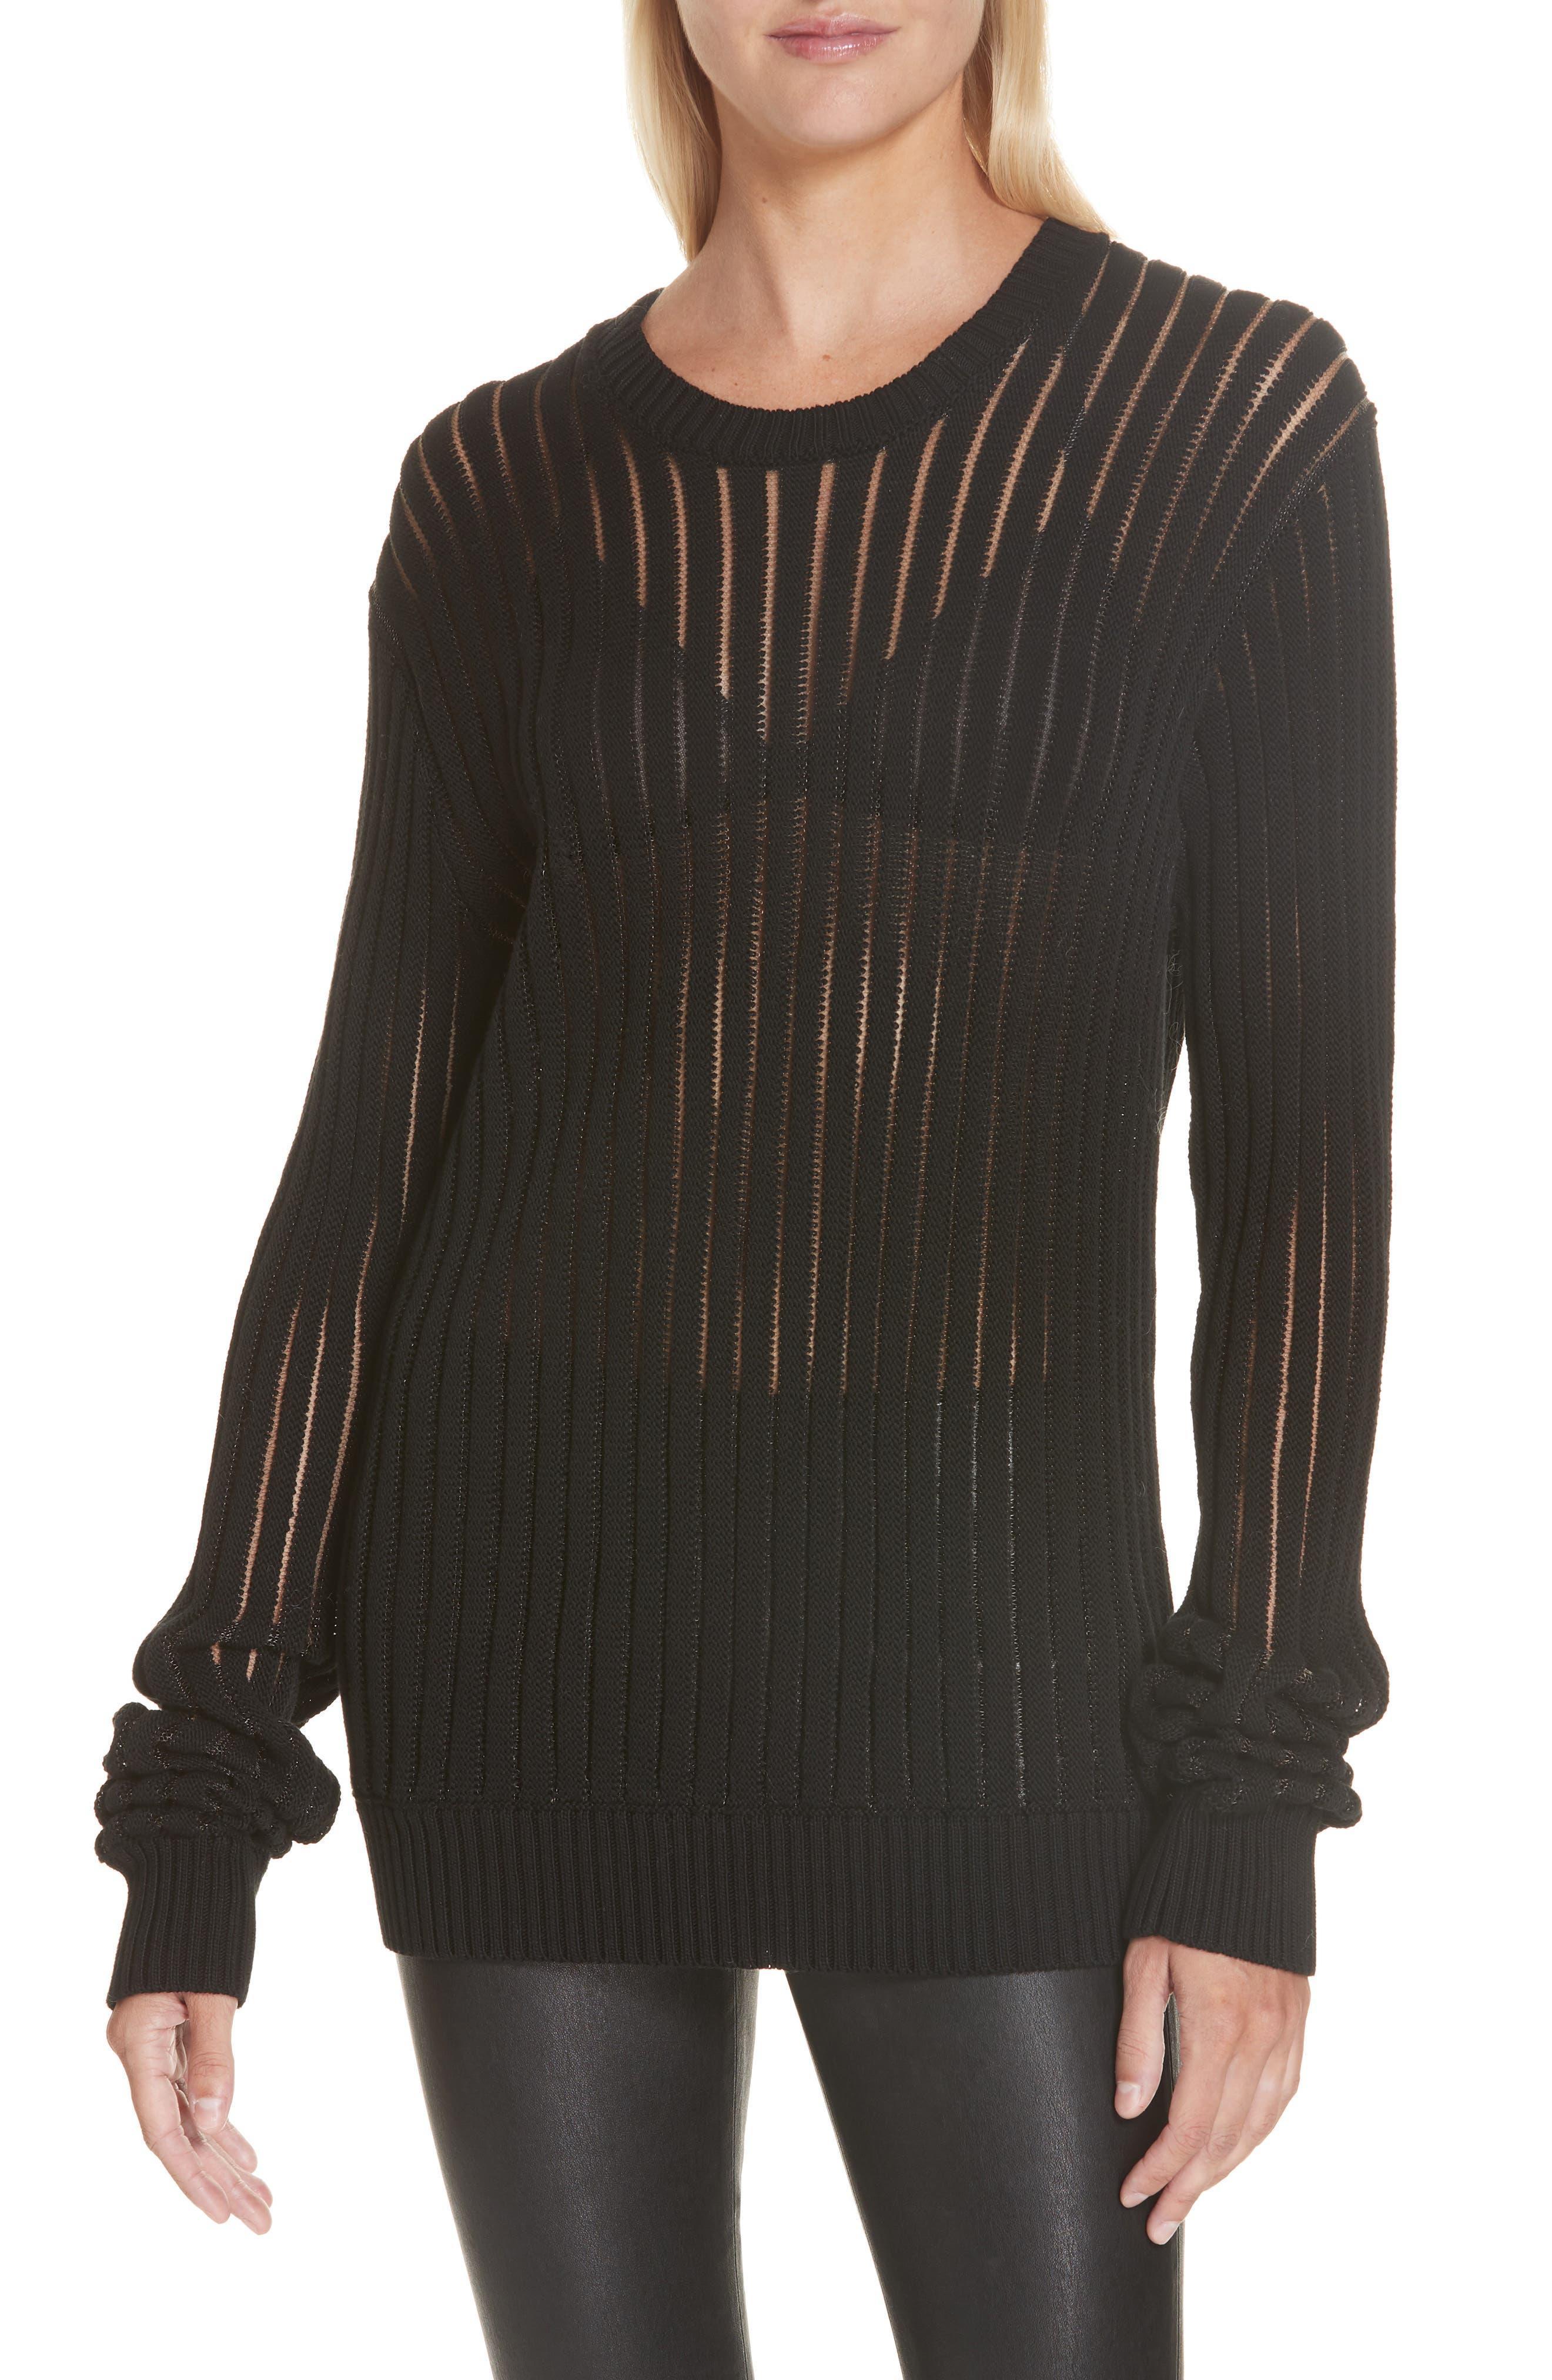 HELMUT LANG, Sheer Stripe Sweater, Main thumbnail 1, color, 001